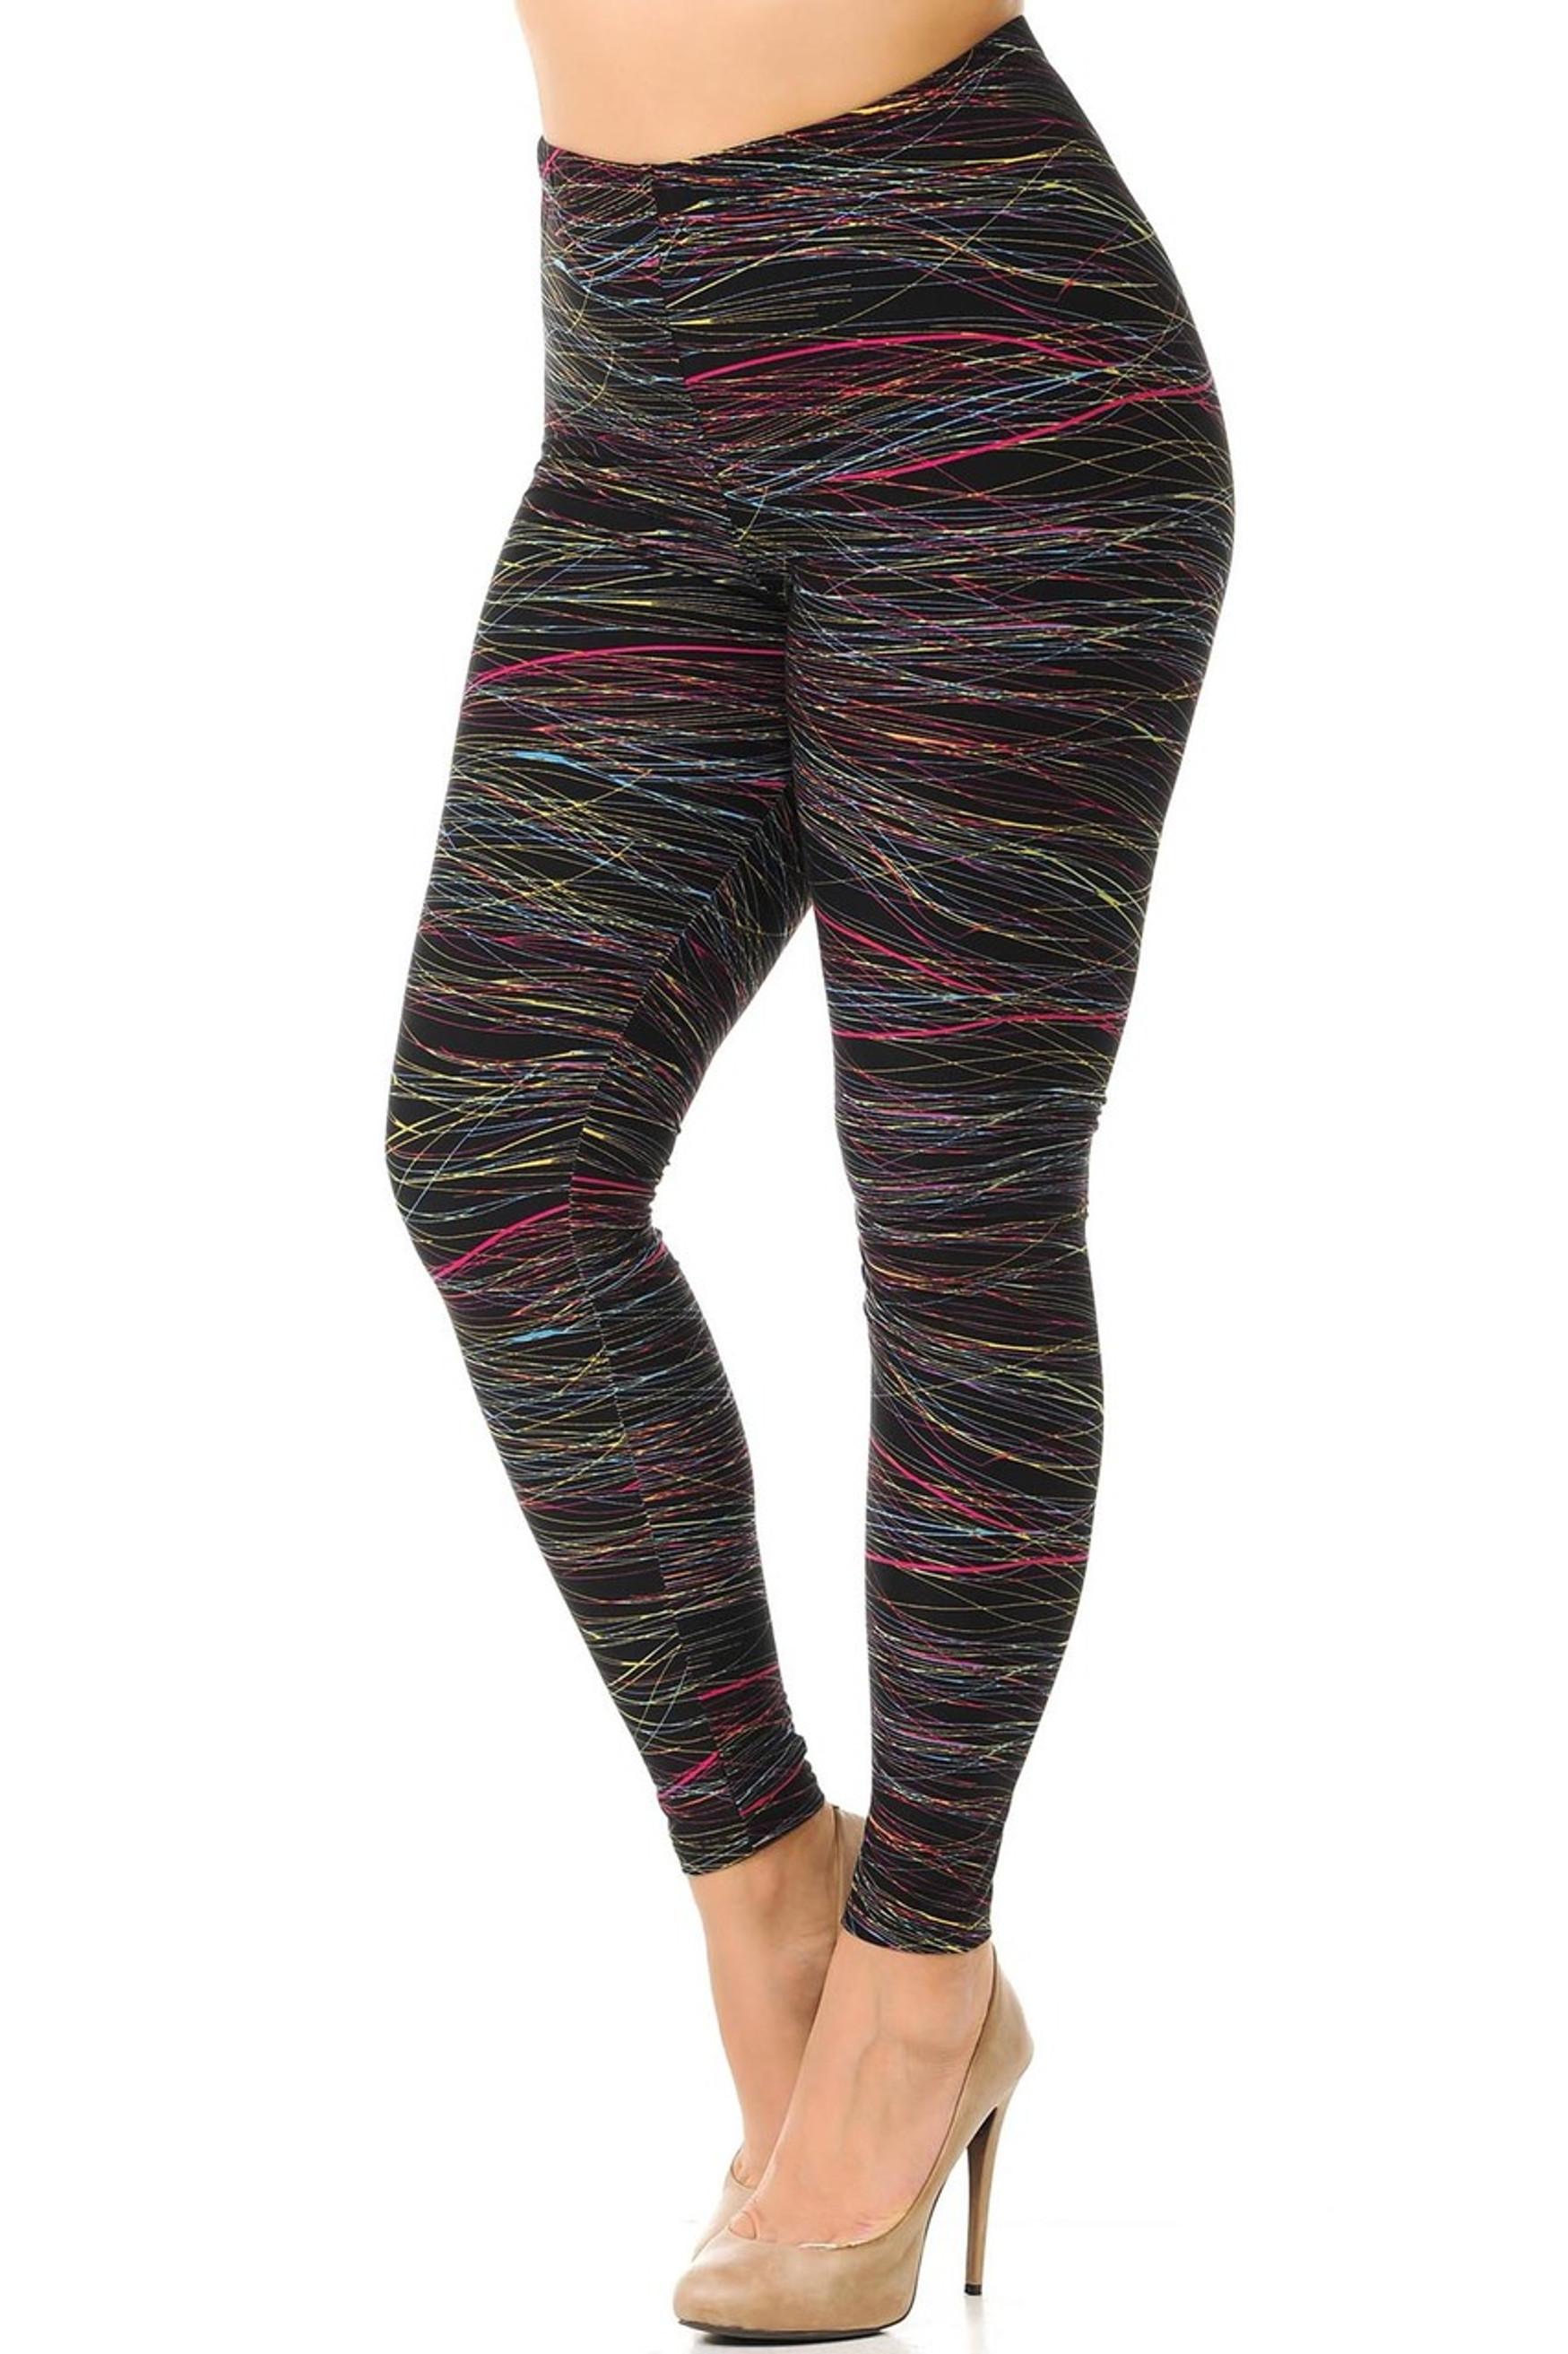 Brushed Rainbow Lines Extra Plus Size Leggings - 3X-5X